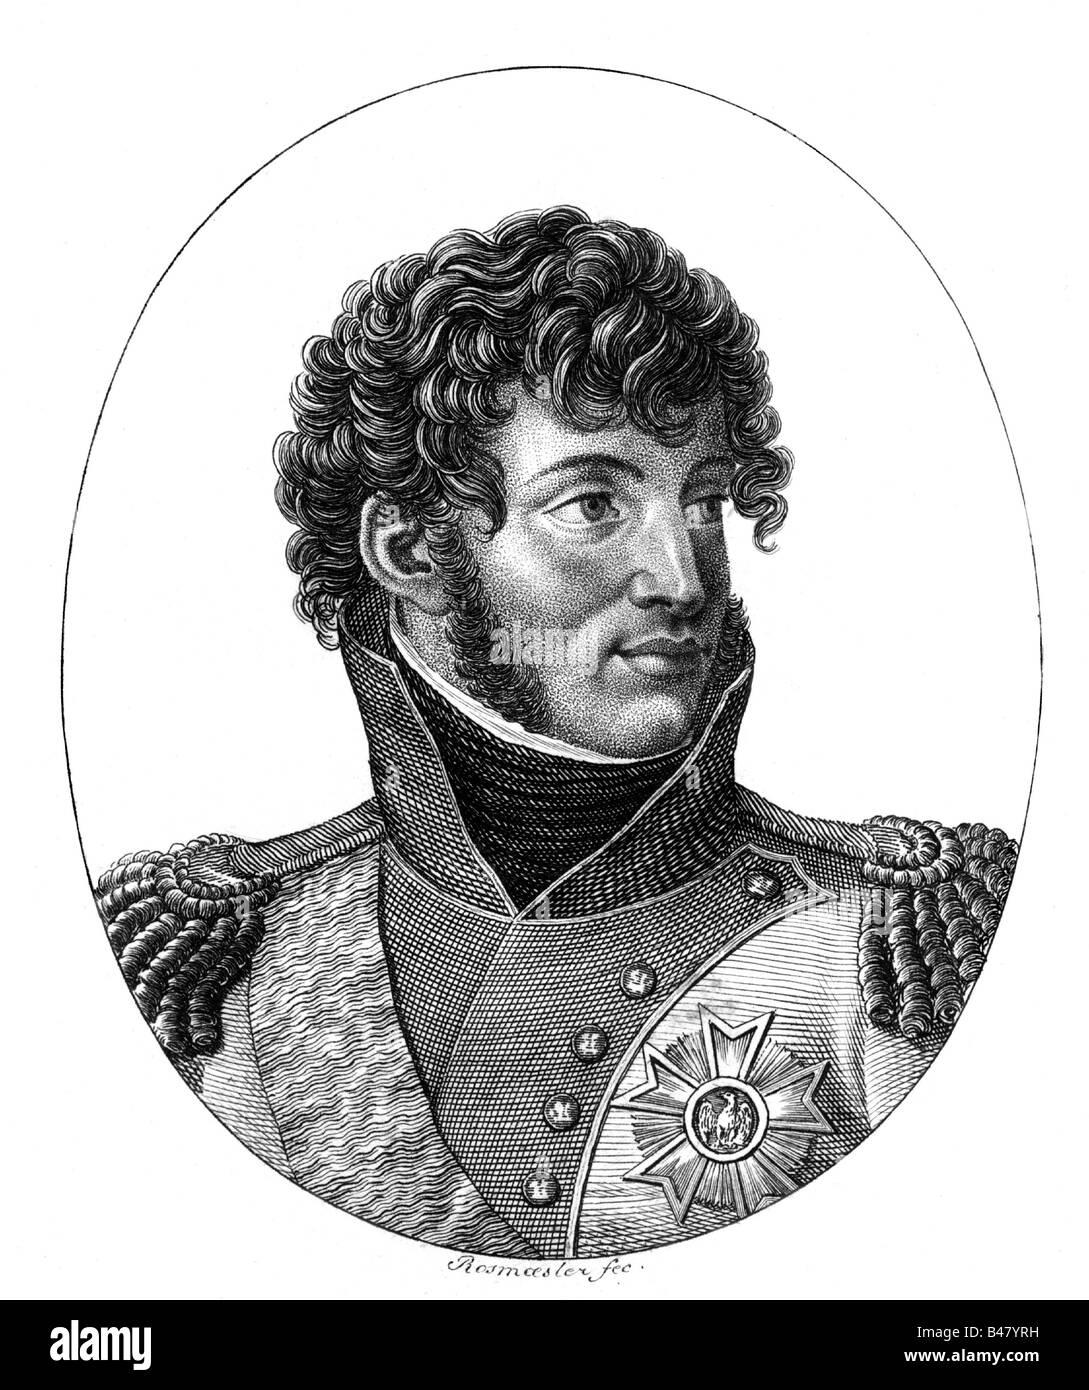 Murat, Joachim, 25.3.1771 - 13.10.1815, French general, portrait, steel engraving by Rosmäaesler, circa 1810, - Stock Image